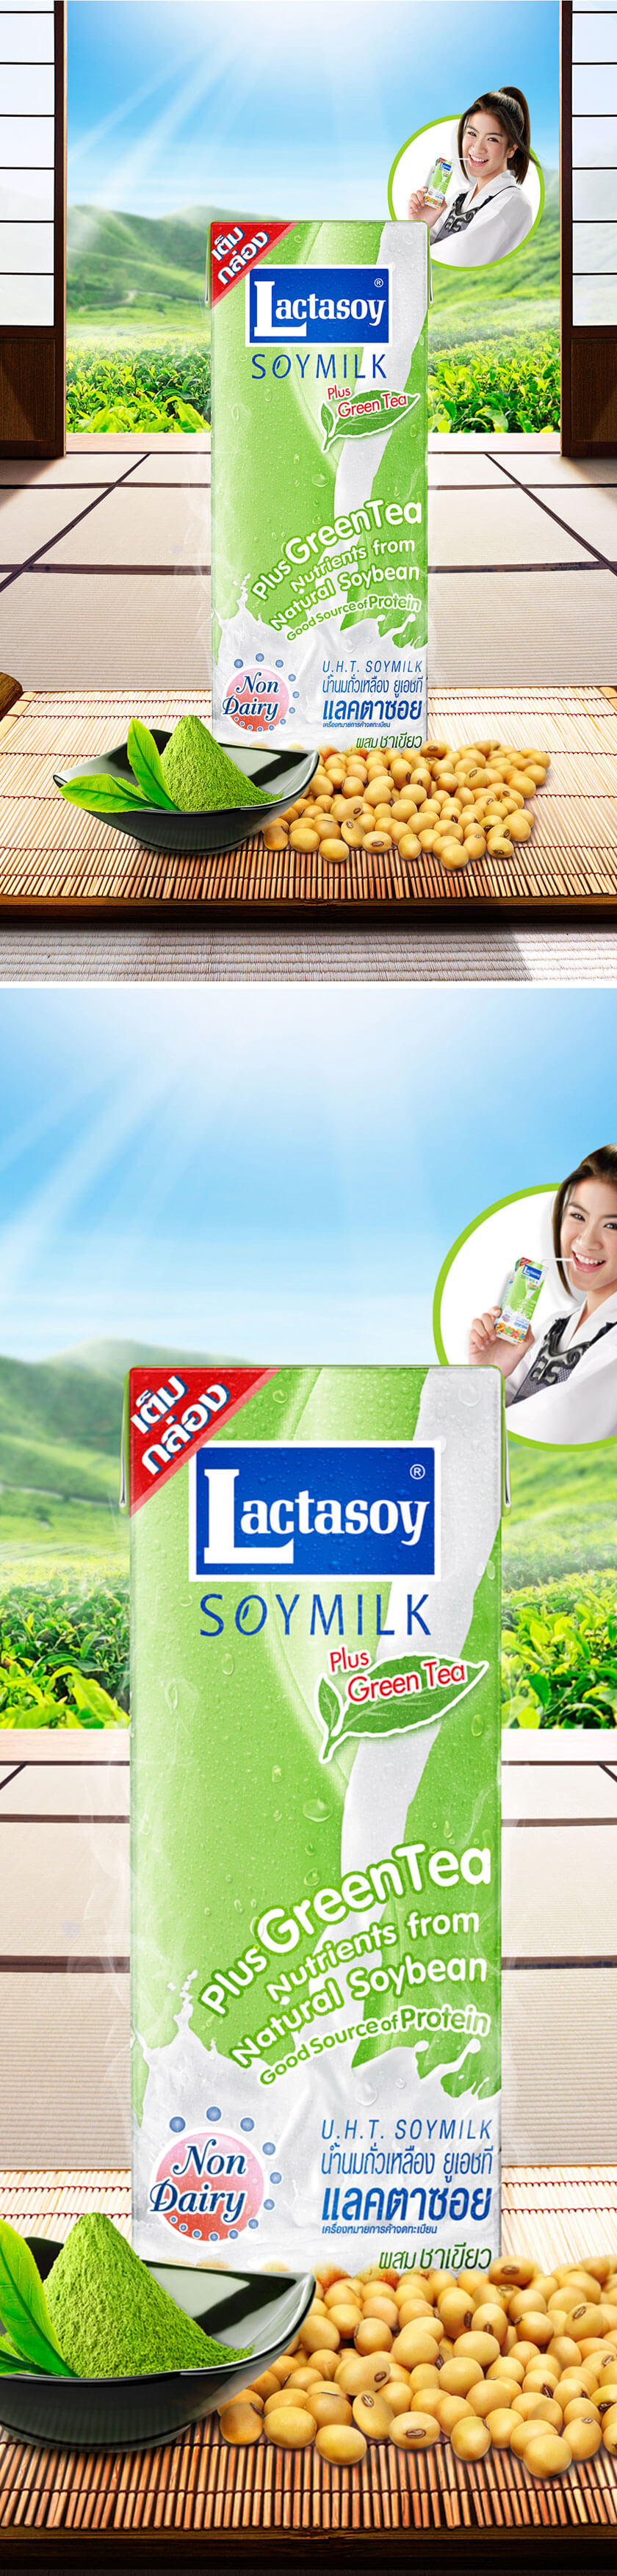 Concept Keyvisual Lactasoy C | MeDee - บริษัทรับทำเว็บไซต์ กราฟฟิกดีไซน์